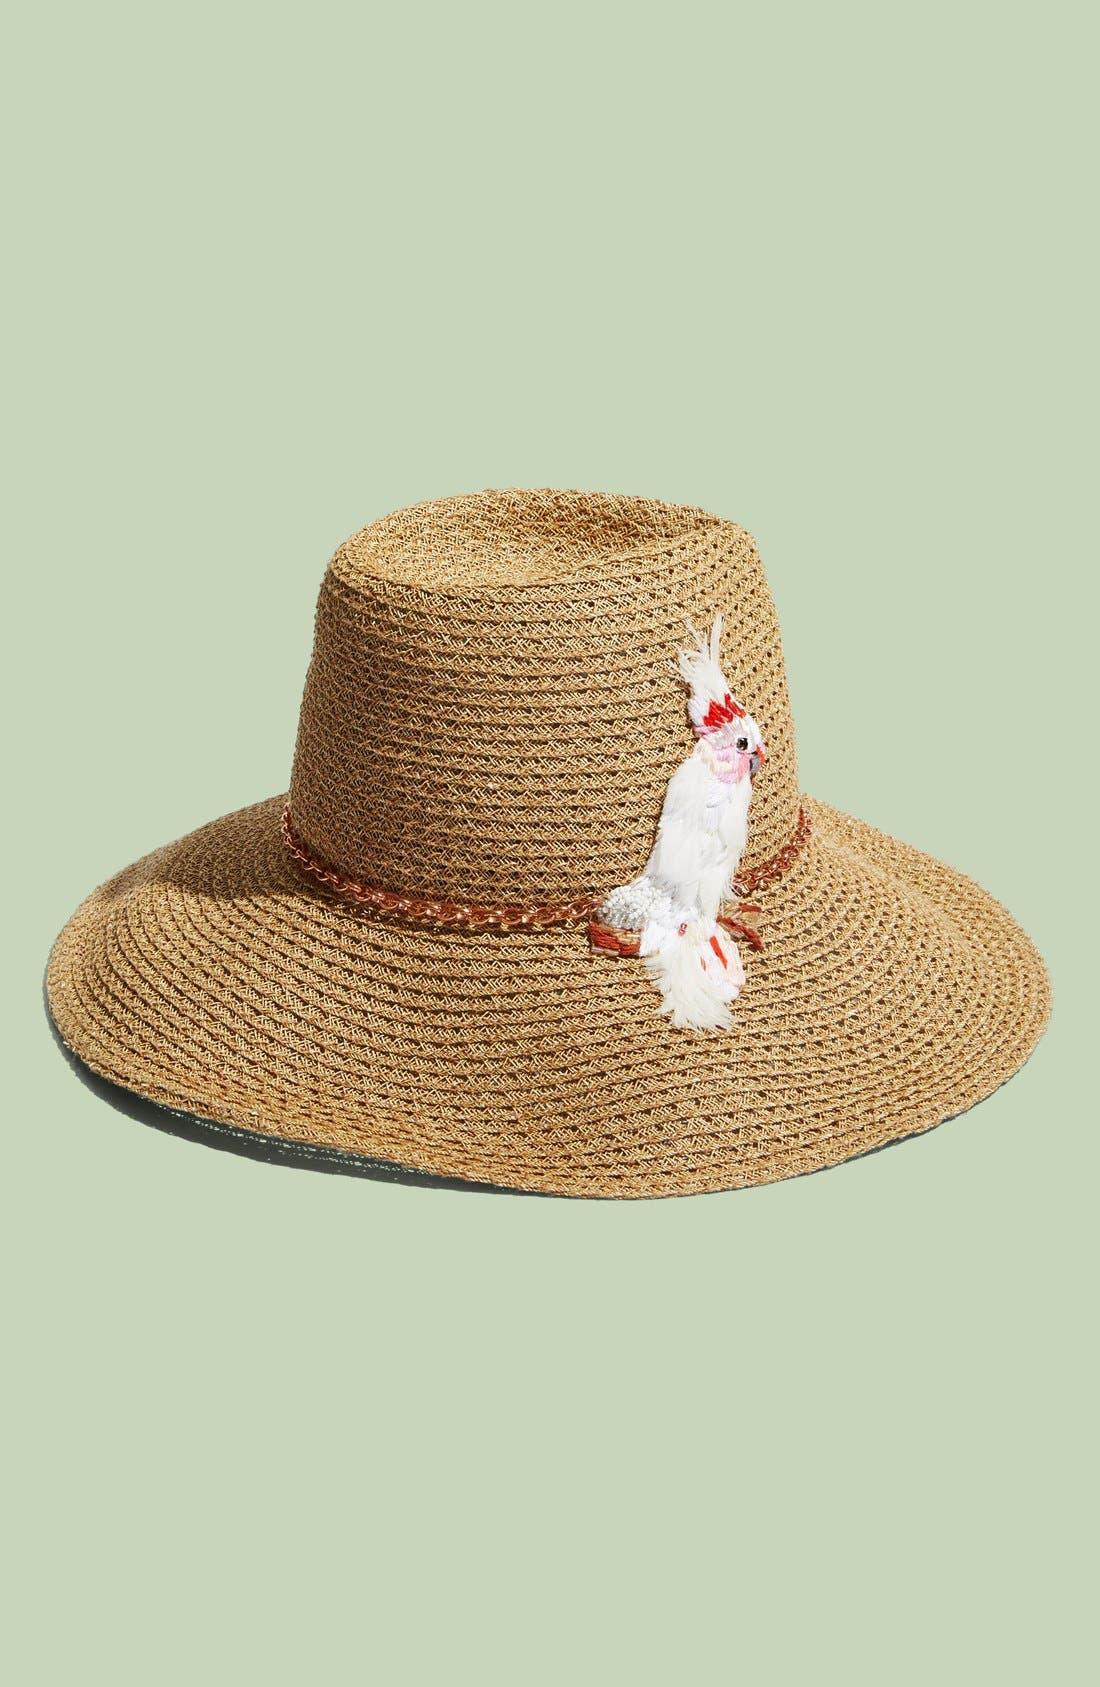 'Emmanuelle' Cockatoo Ornament Straw Hat,                         Main,                         color, 250